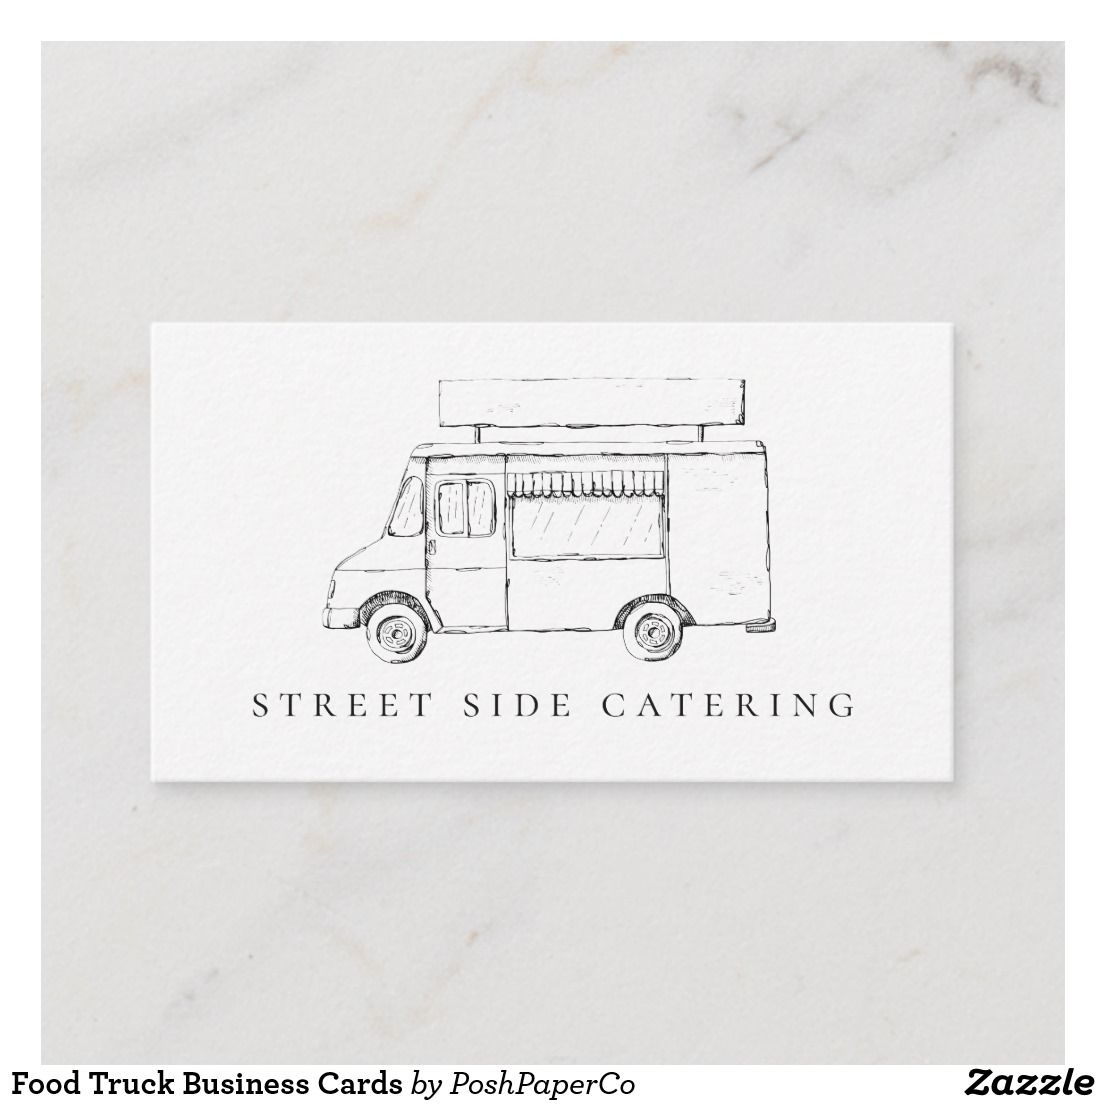 Food Truck Business Cards Zazzle Com Food Truck Business Food Truck Small Business Cards